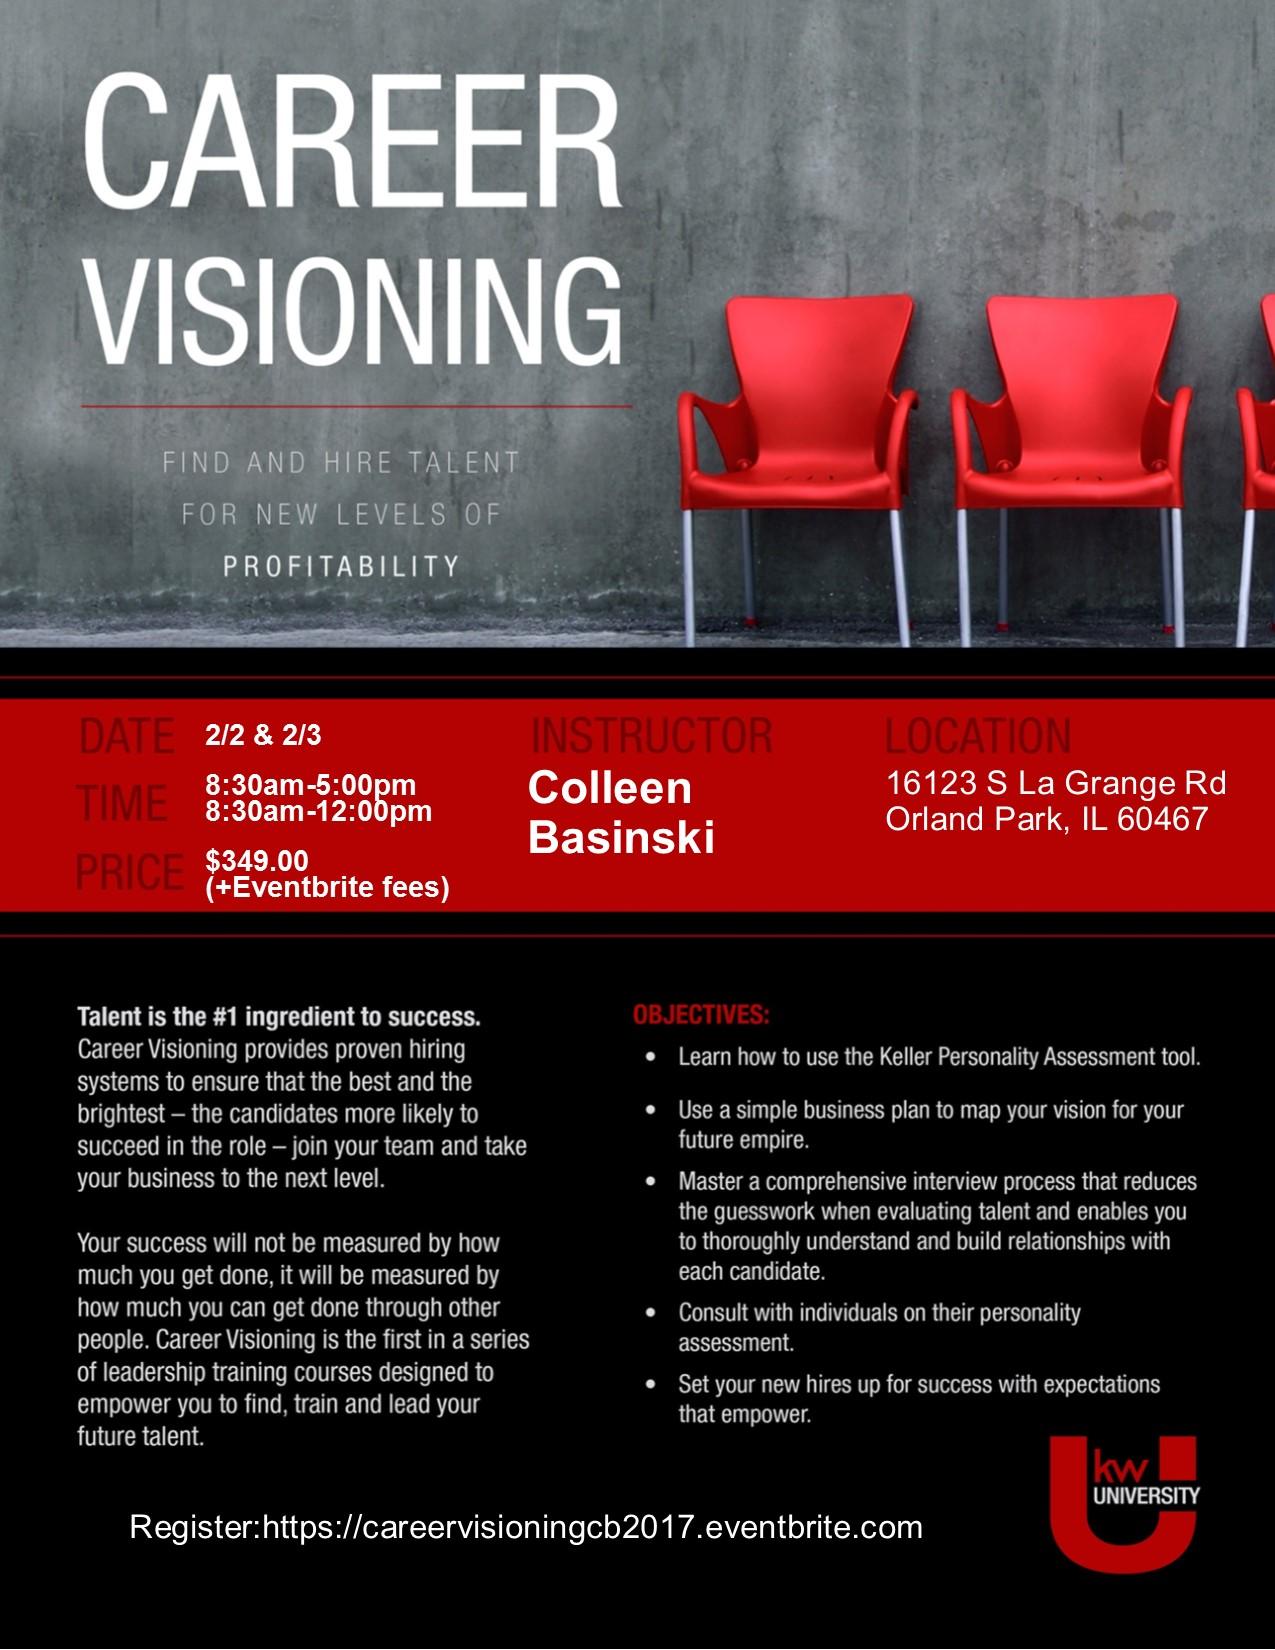 Career Vision 2017